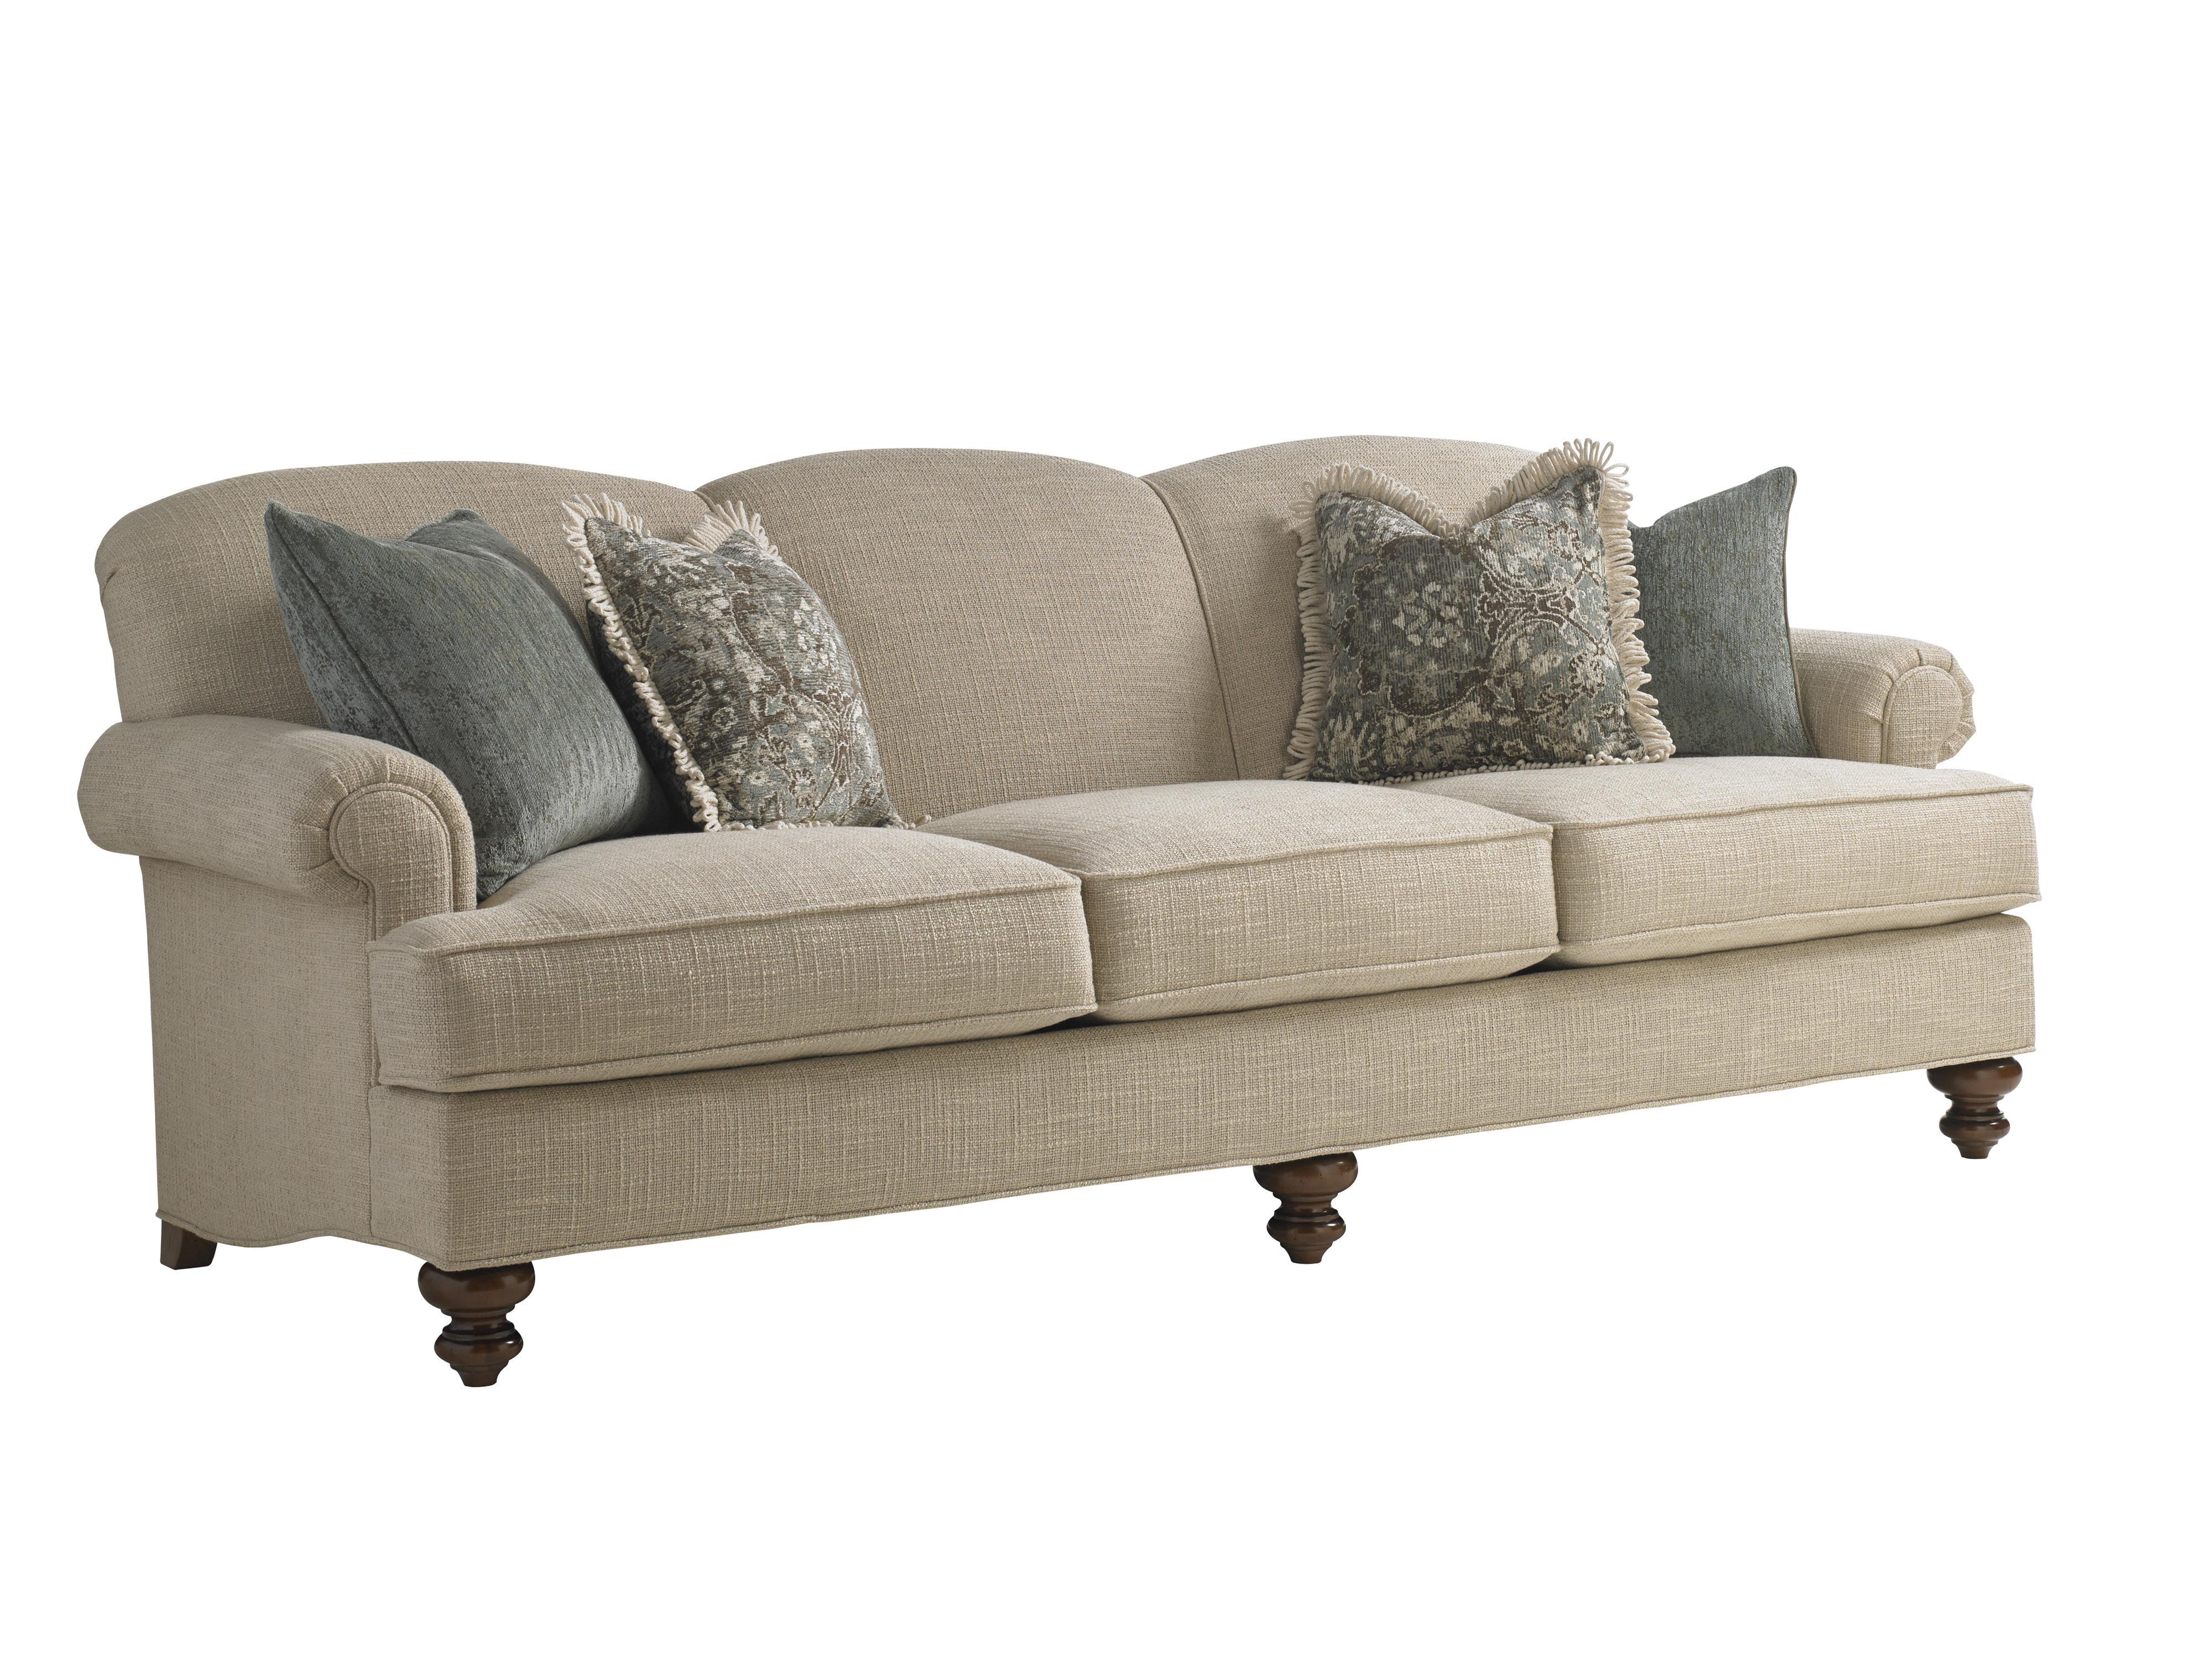 Asbury Sofa